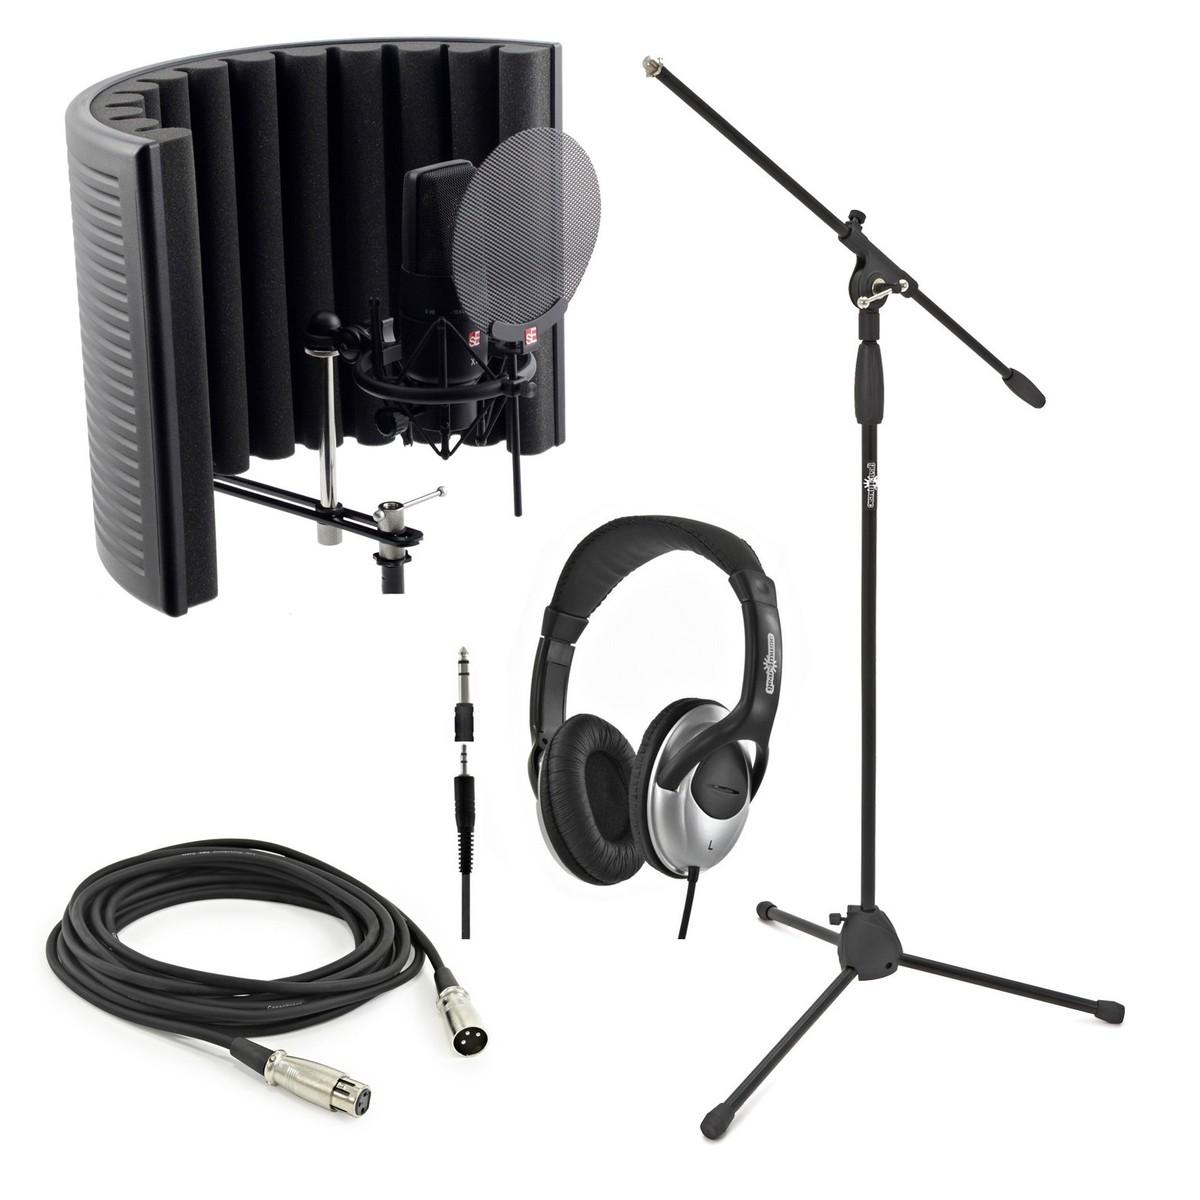 Image of sE Electronics X1 Studio Bundle with Headphones and Mic Stand